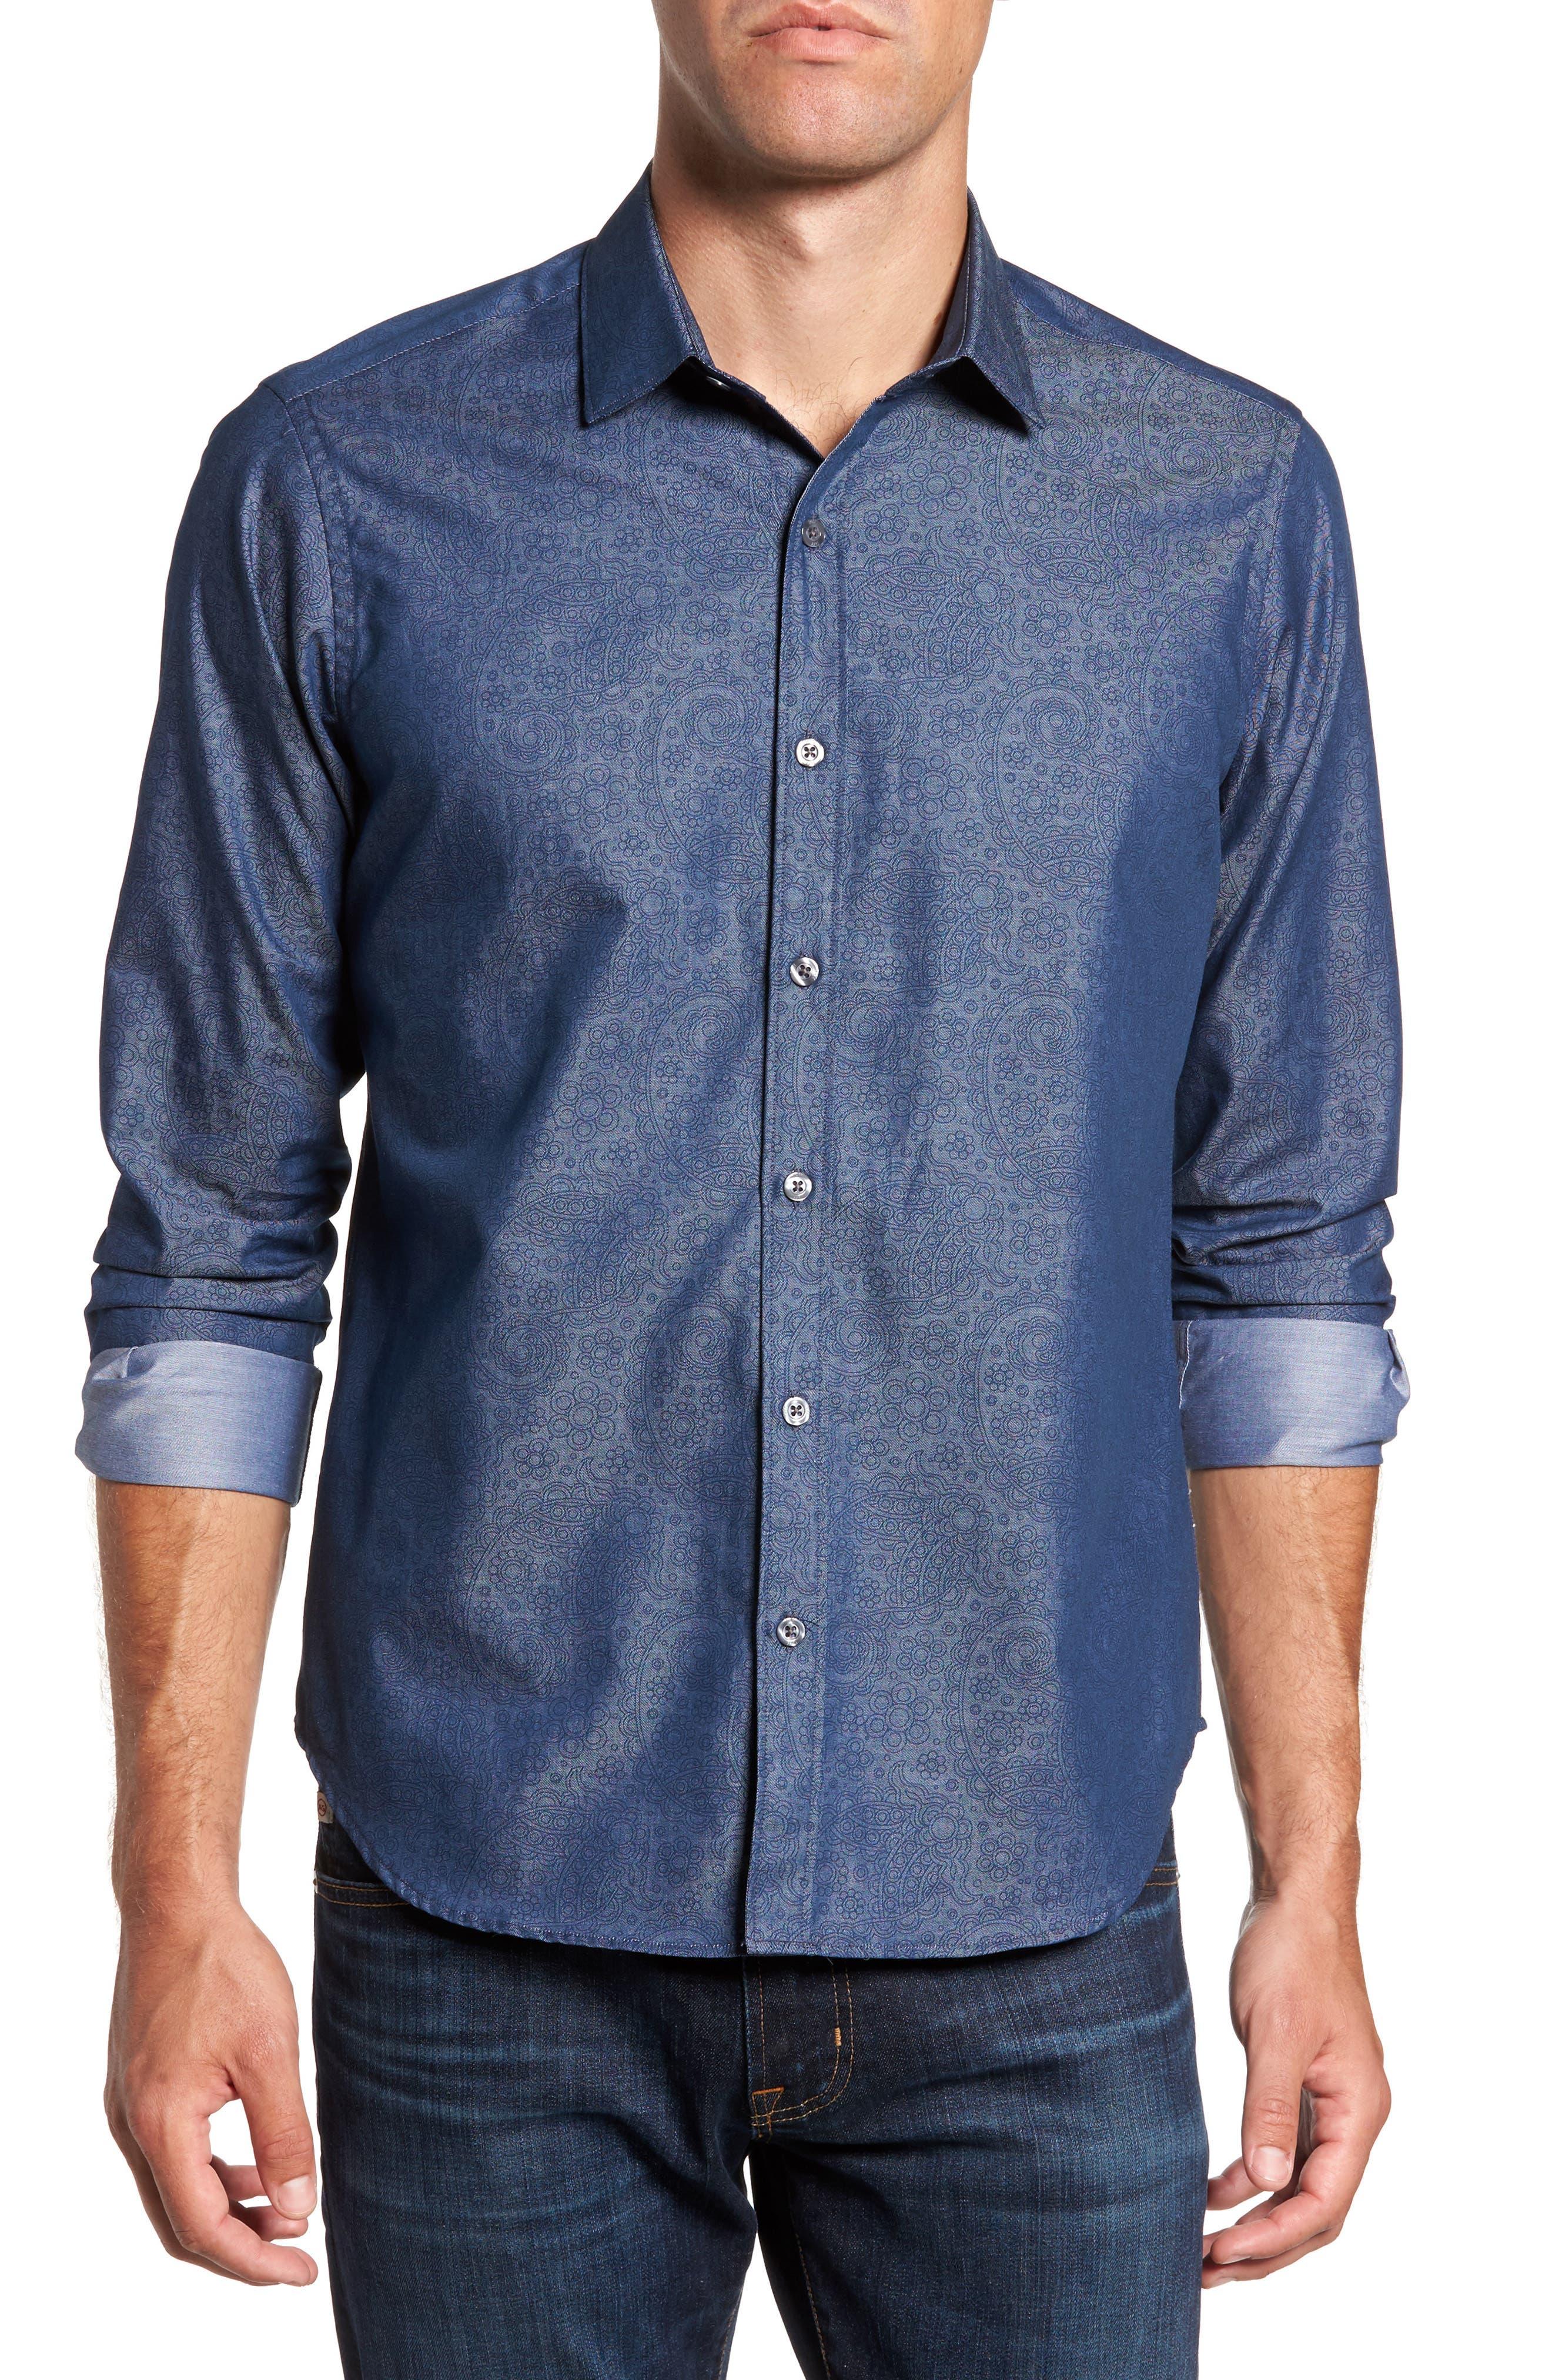 Alternate Image 1 Selected - Jeff Edison Slim Fit Paisley Print Sport Shirt